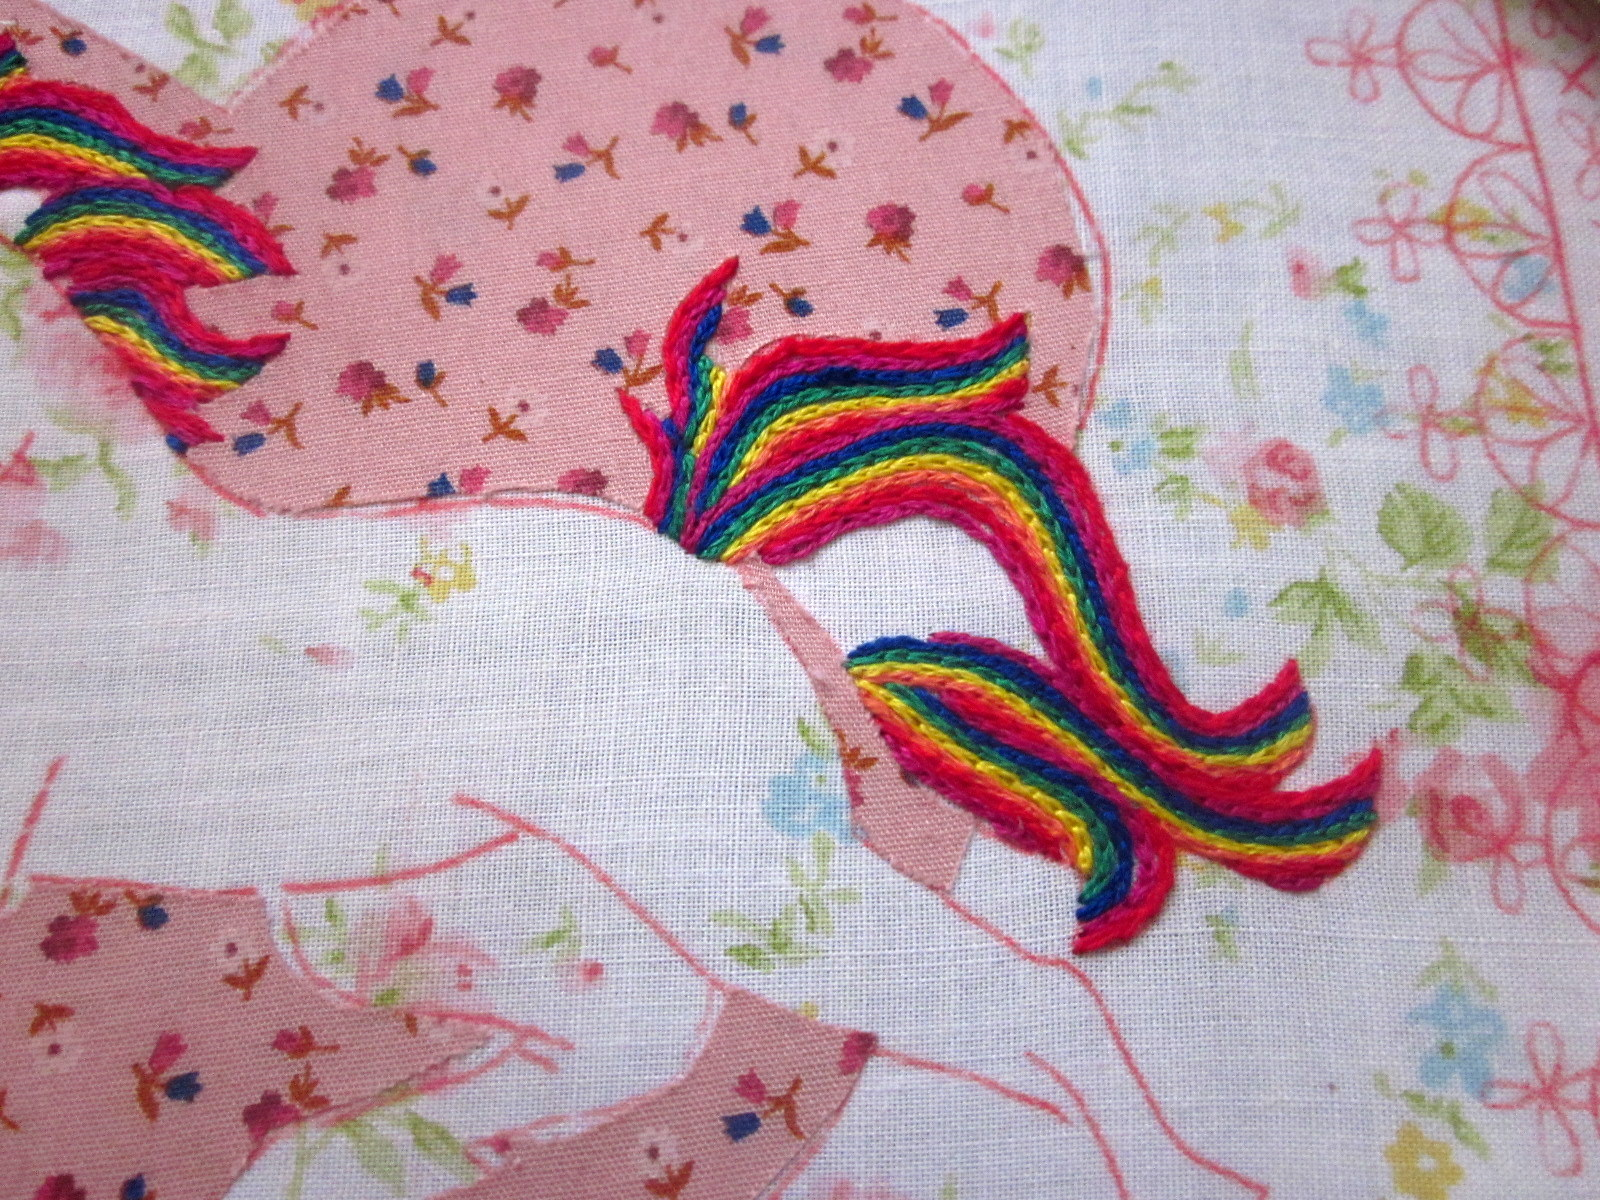 Geekysweetheart Unicorn Embroidery Finished Kinda And